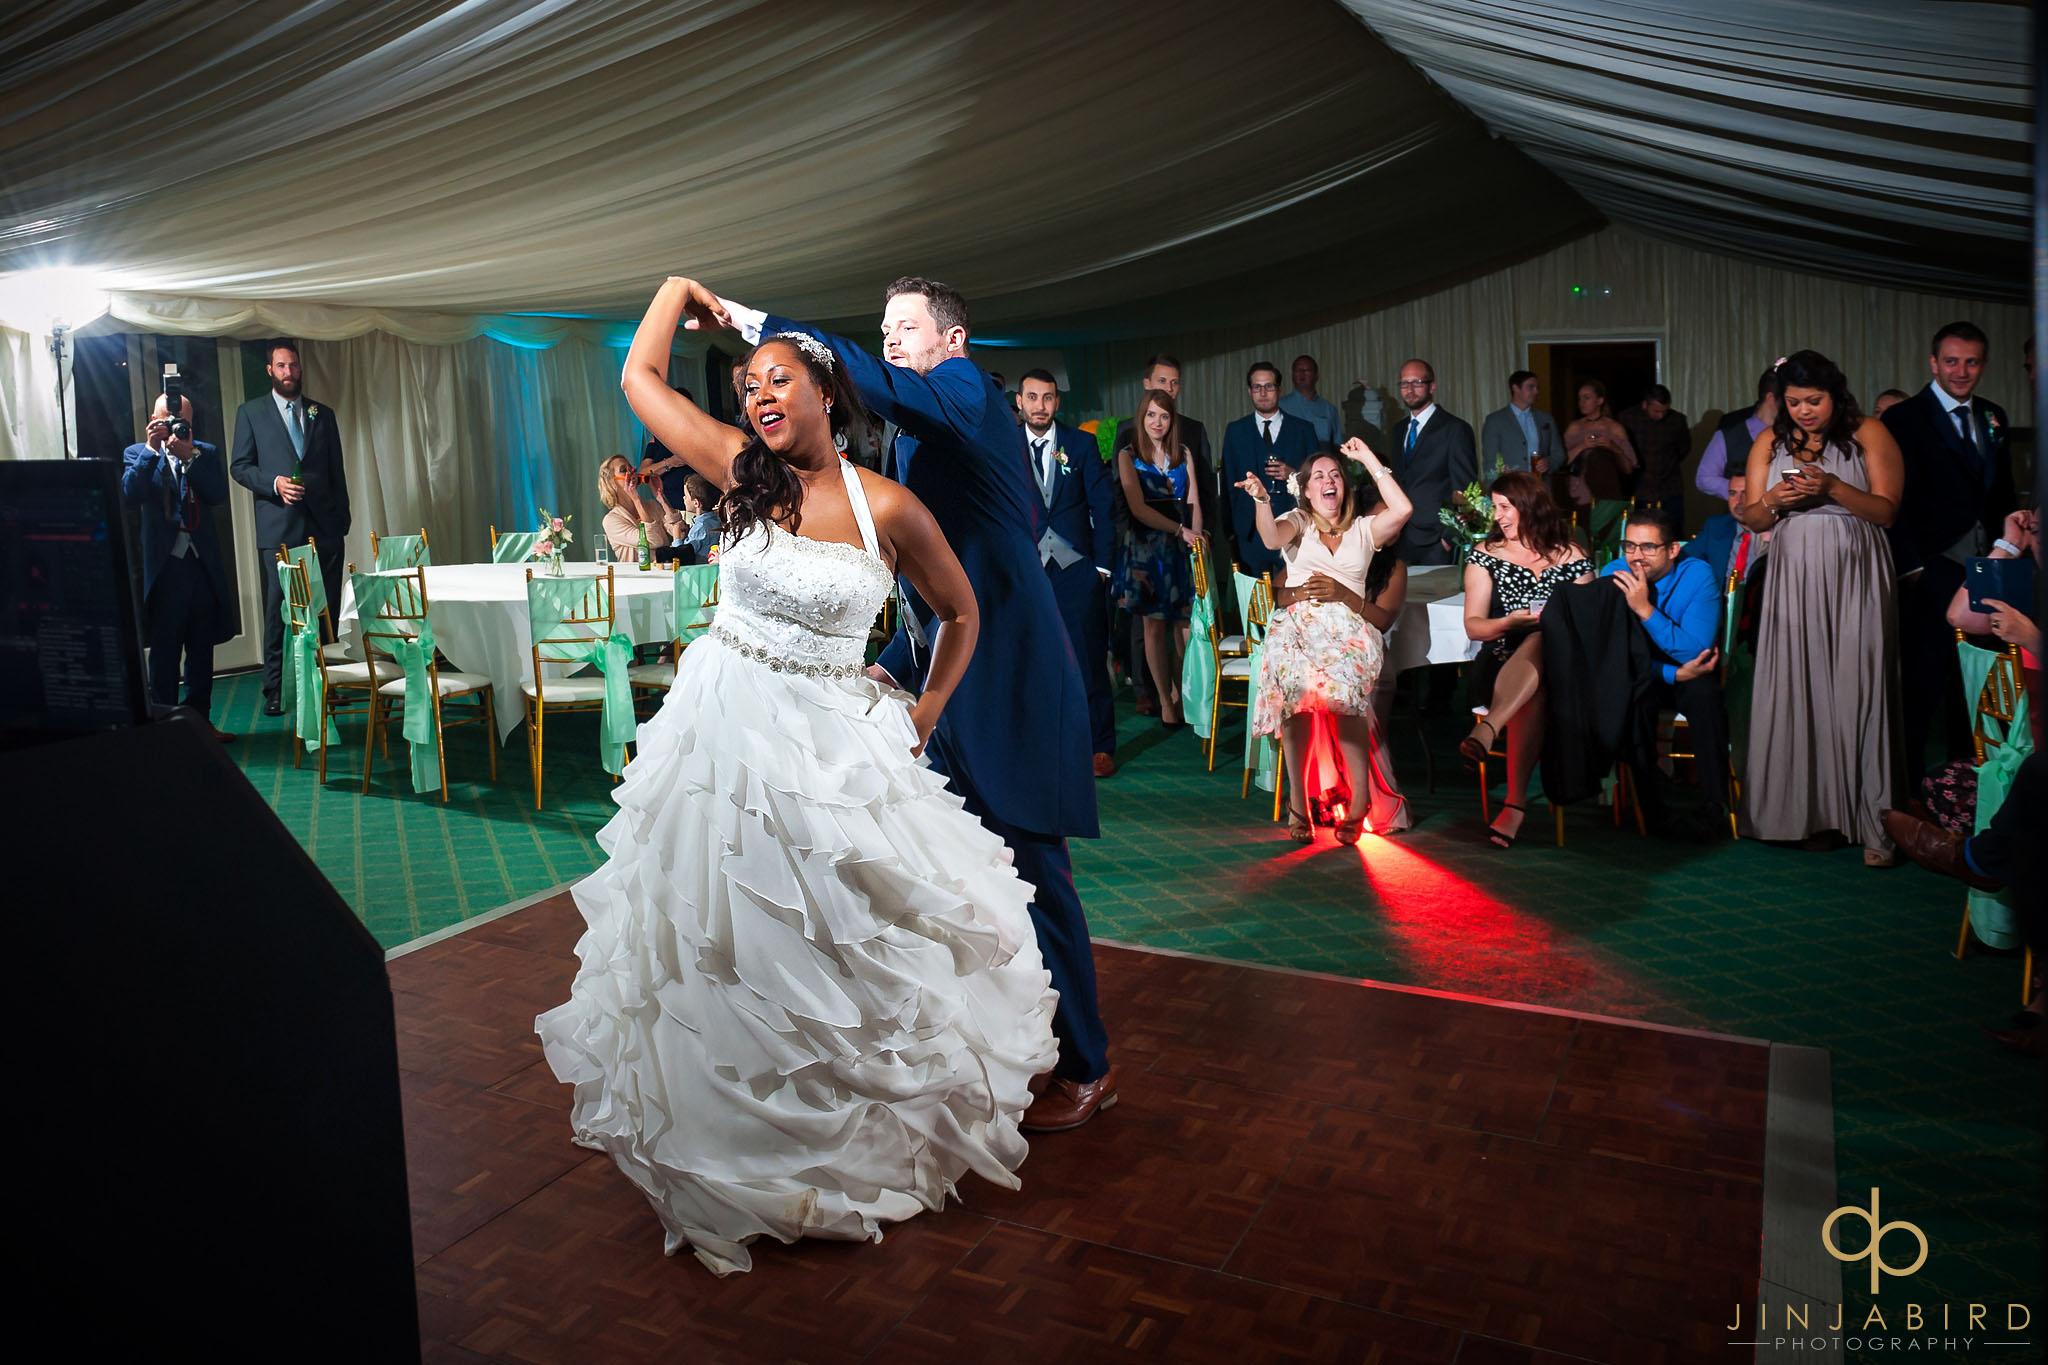 bride-dancing-with-groom-highgate-house